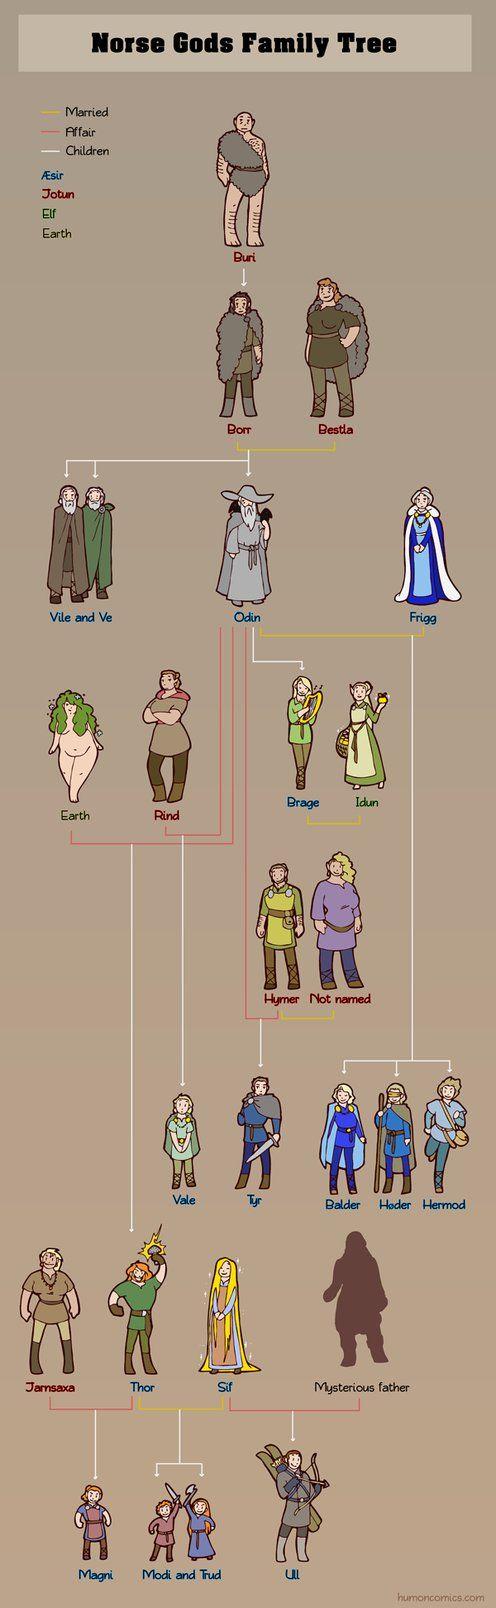 Norse Gods Family Tree by humon